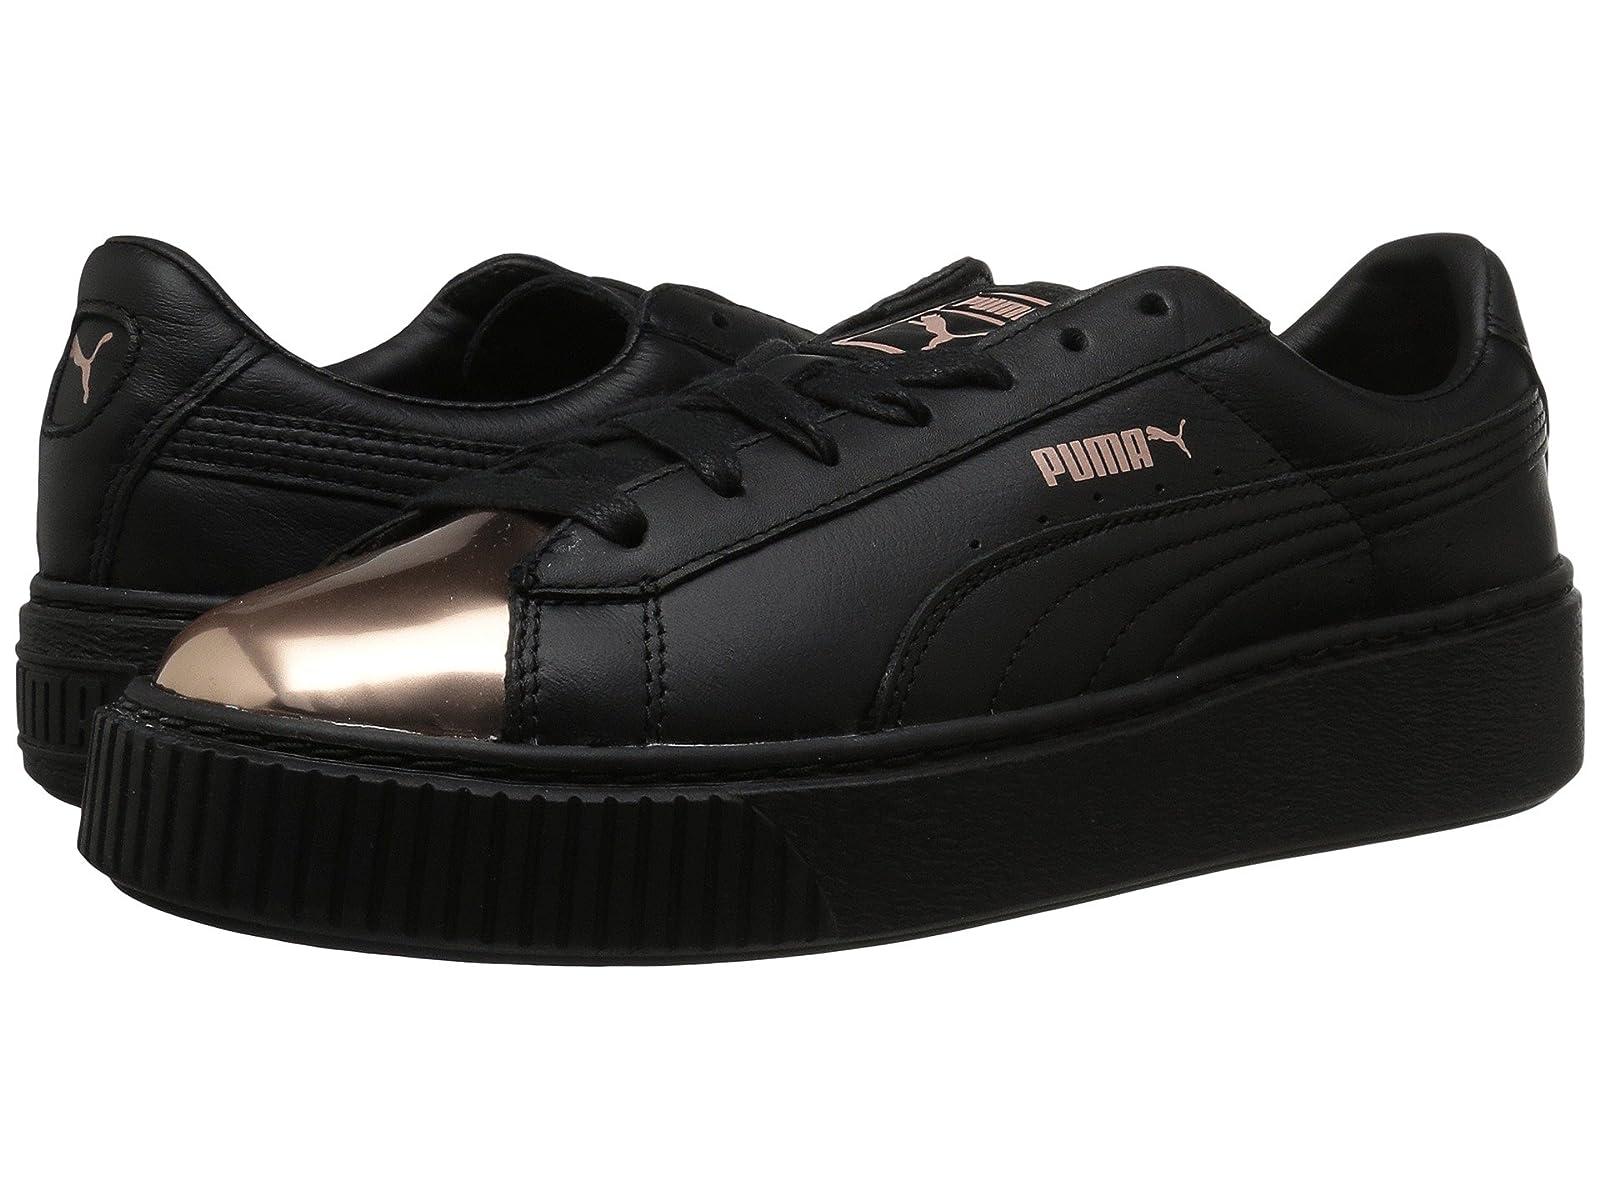 PUMA Basket Platform MetallicCheap and distinctive eye-catching shoes